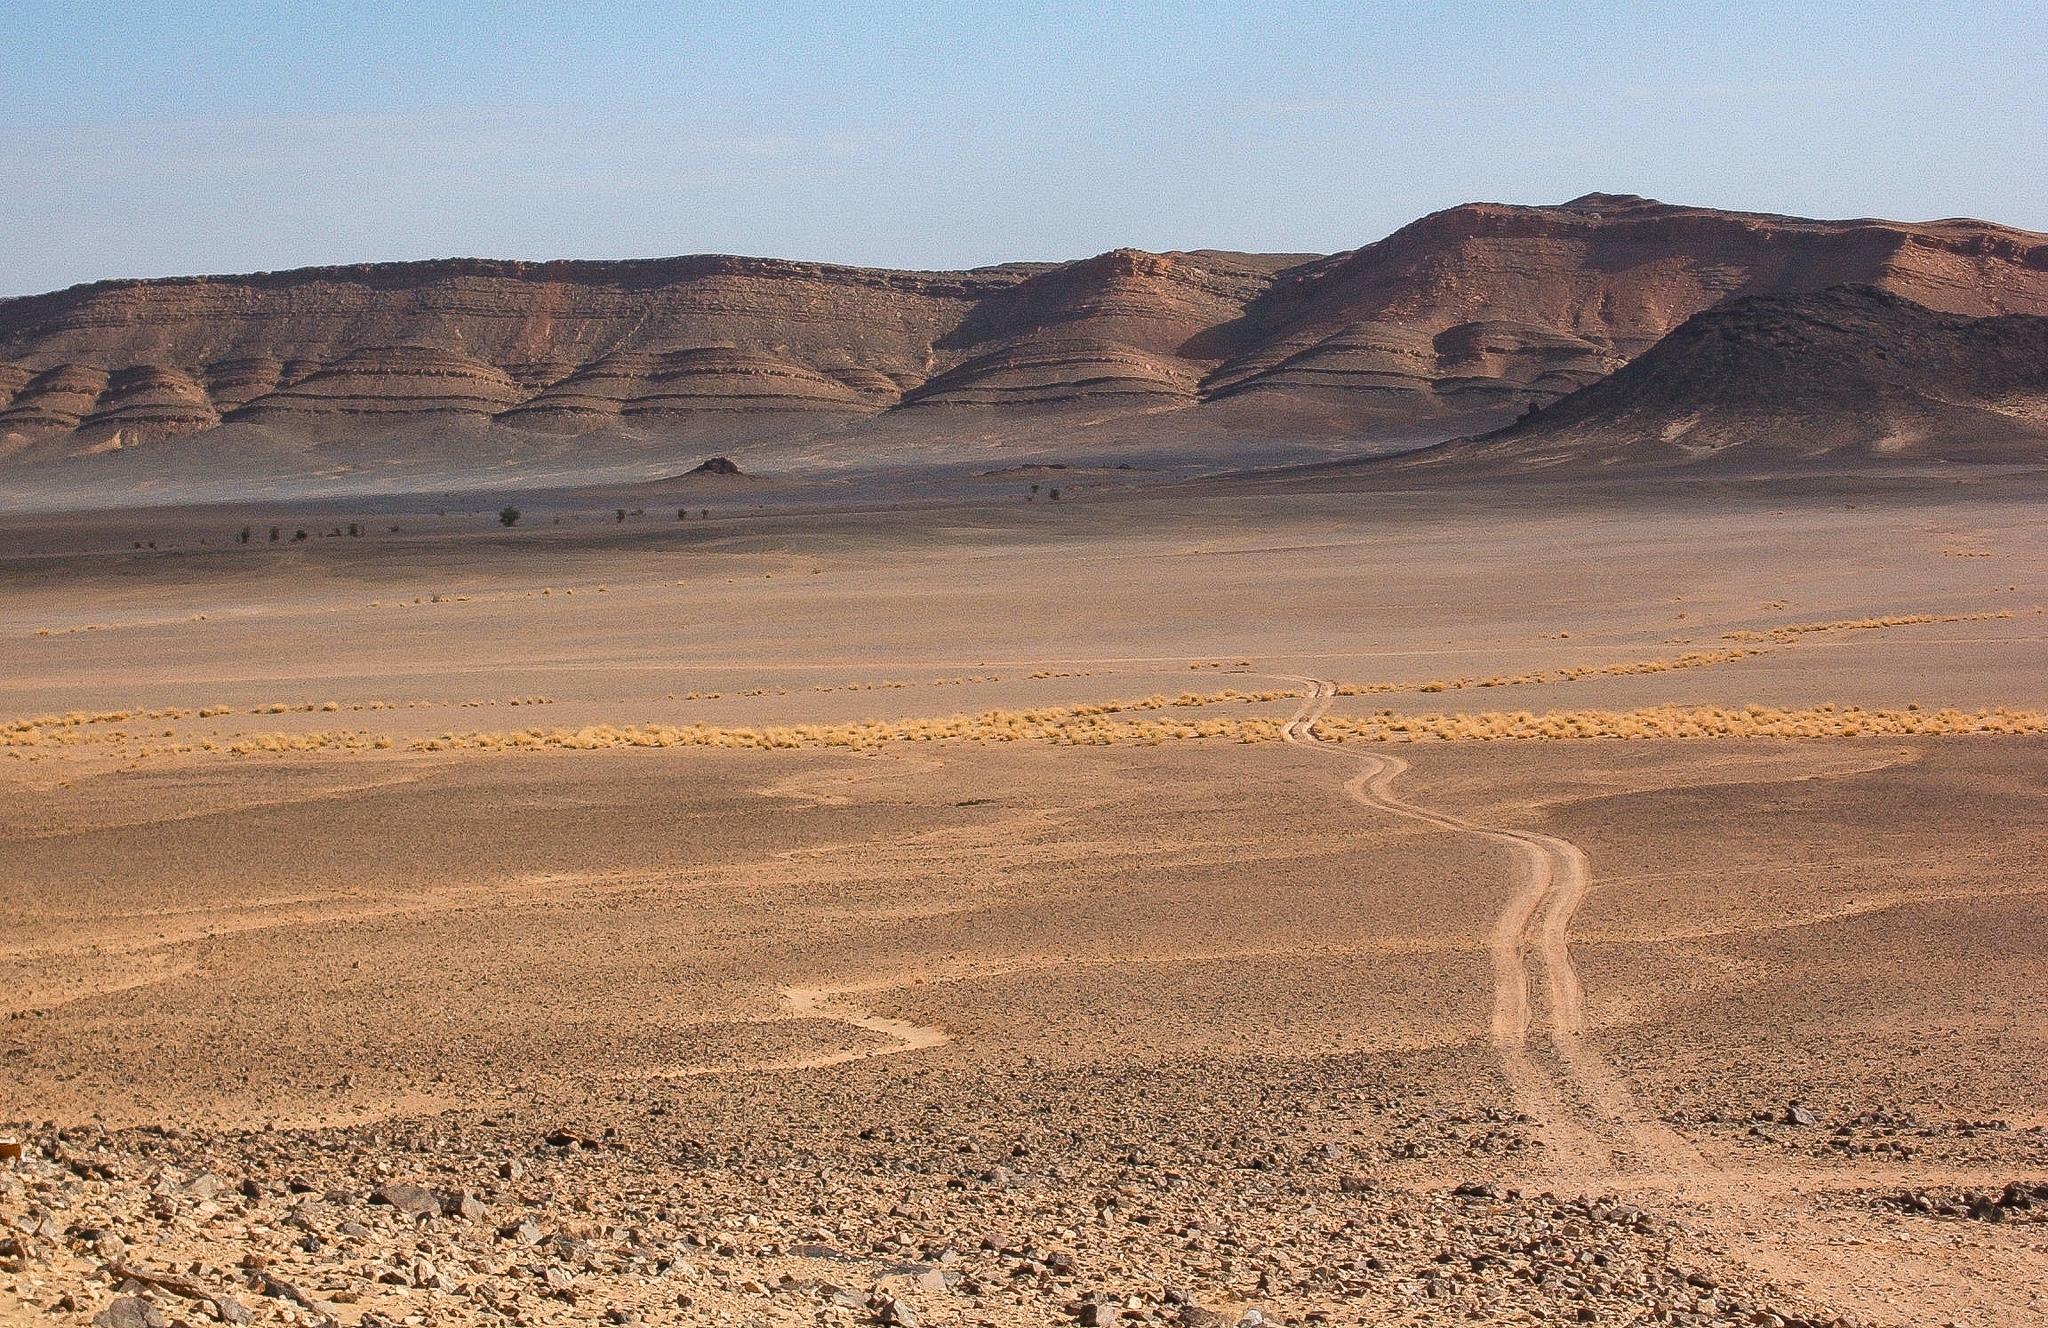 INTO THE DESERT.